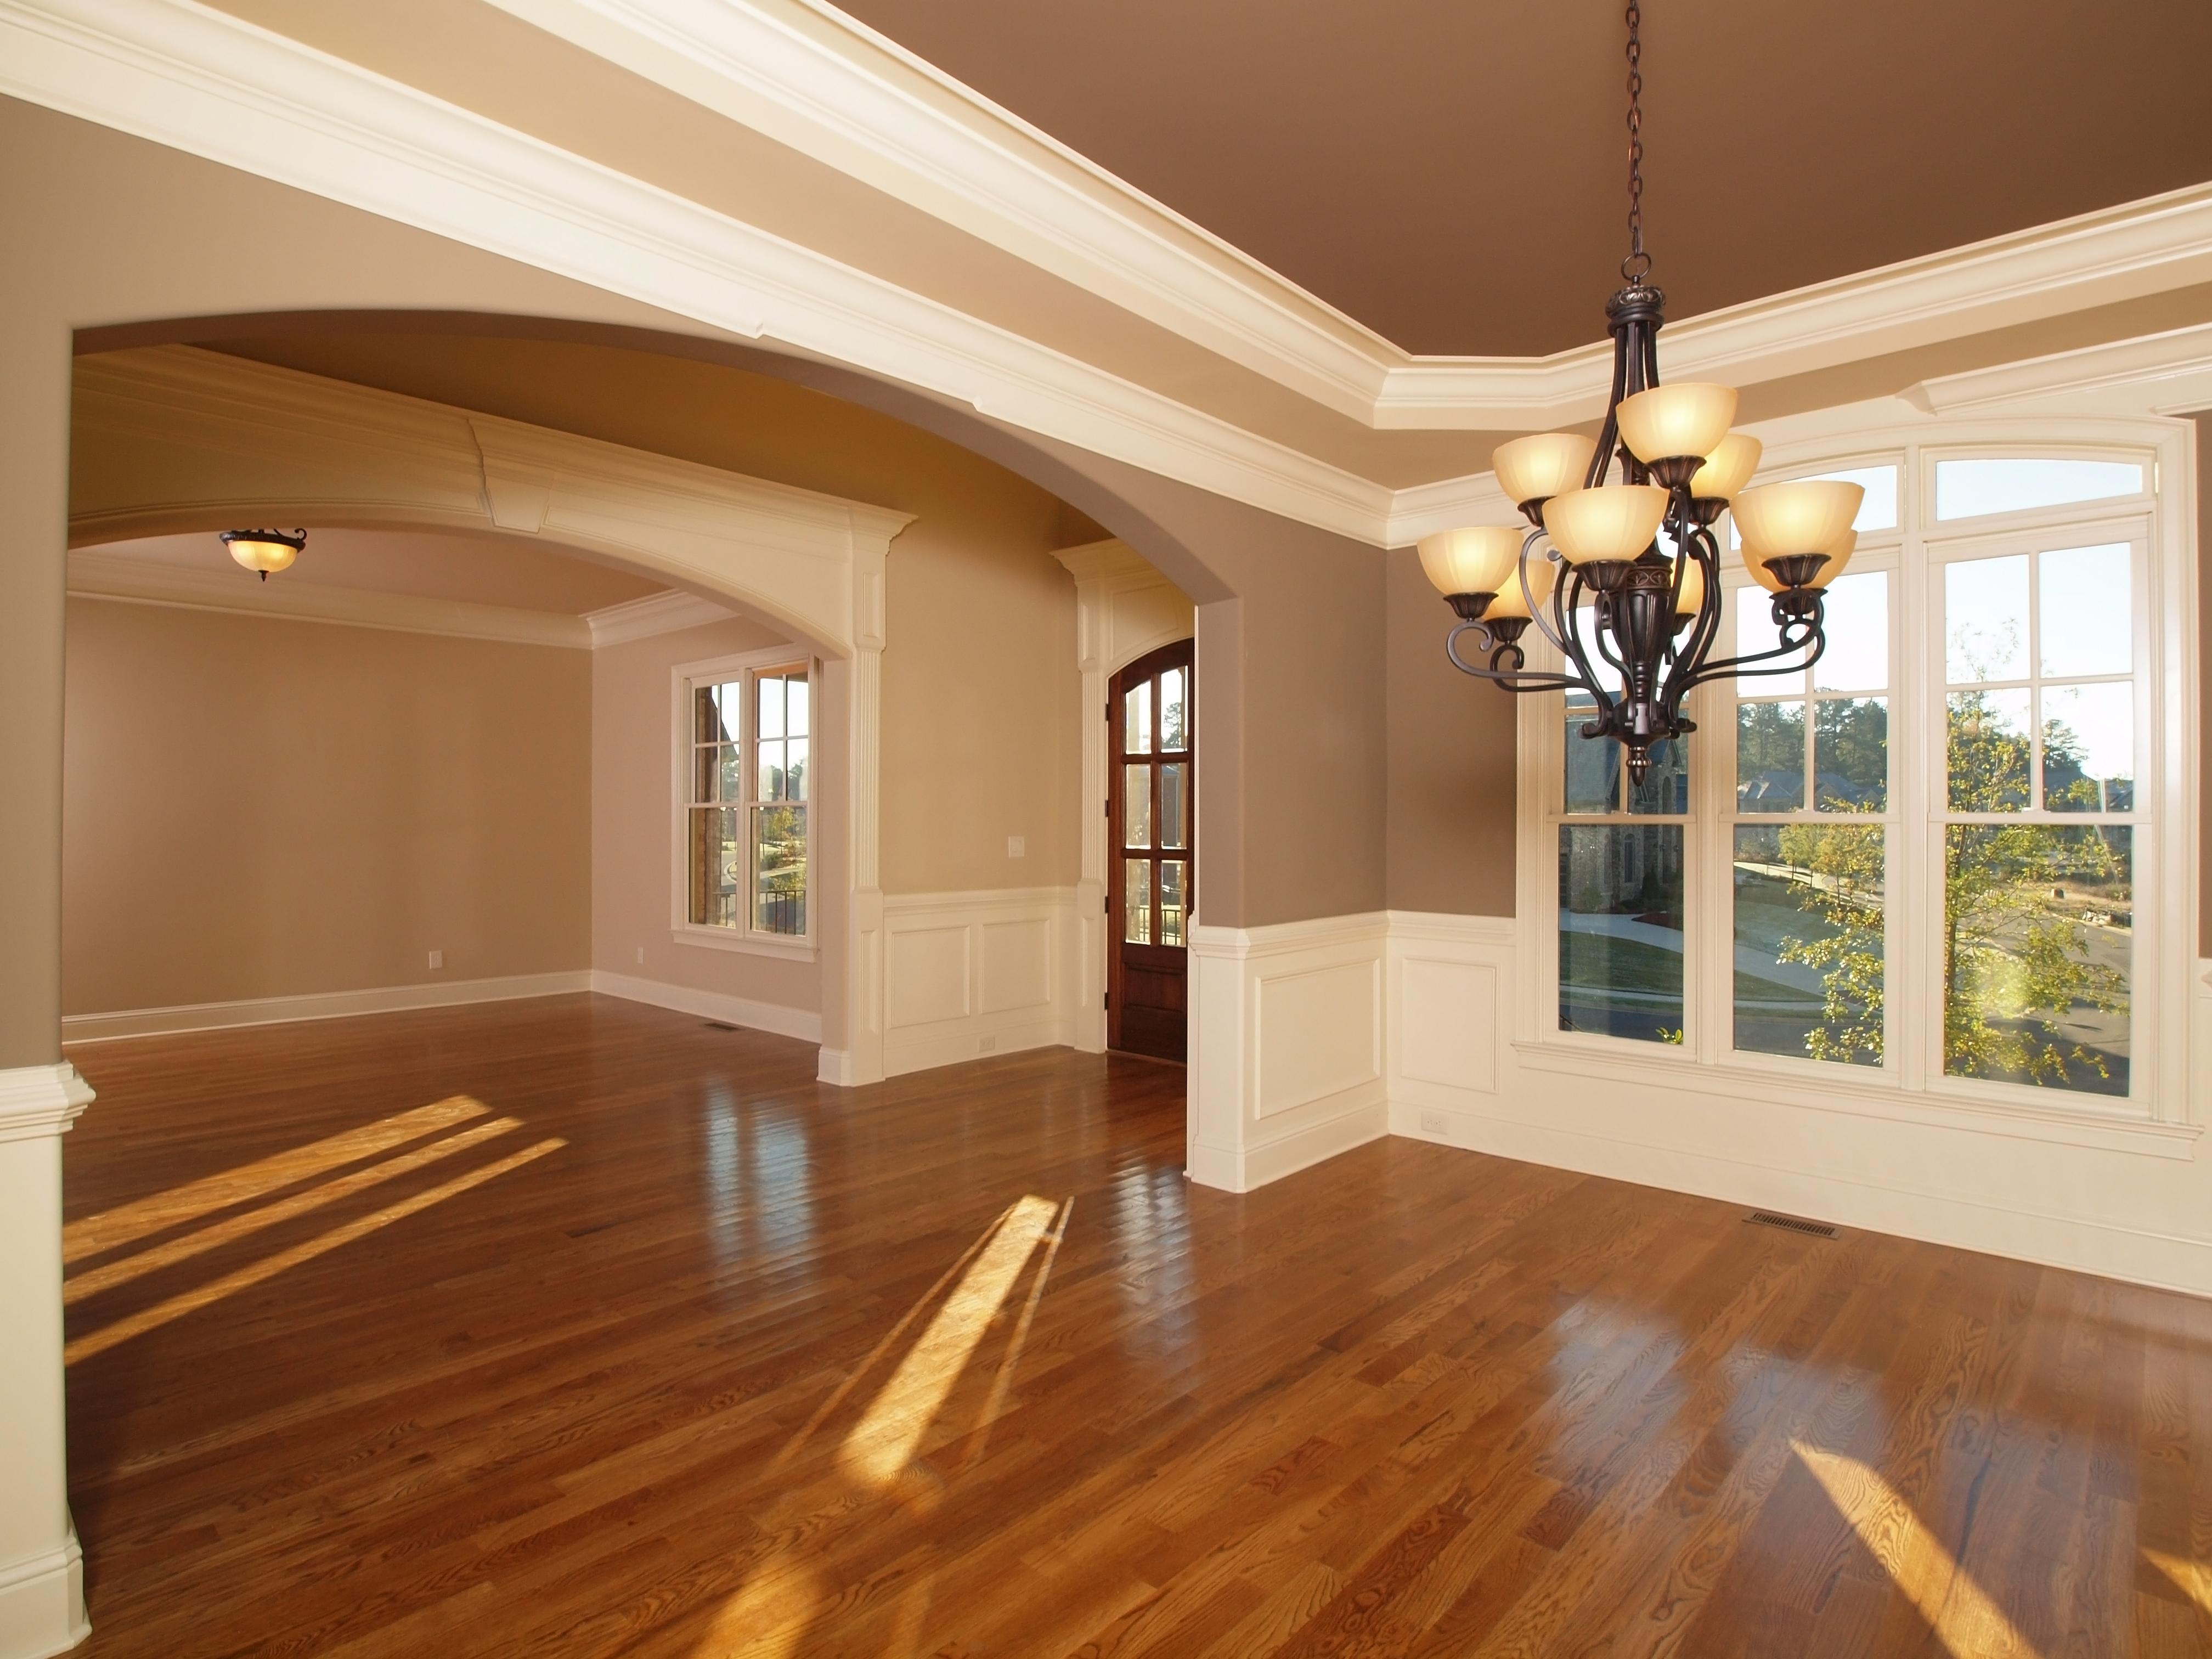 bigstock-Model-Luxury-Home-Interior-Fro-6410788